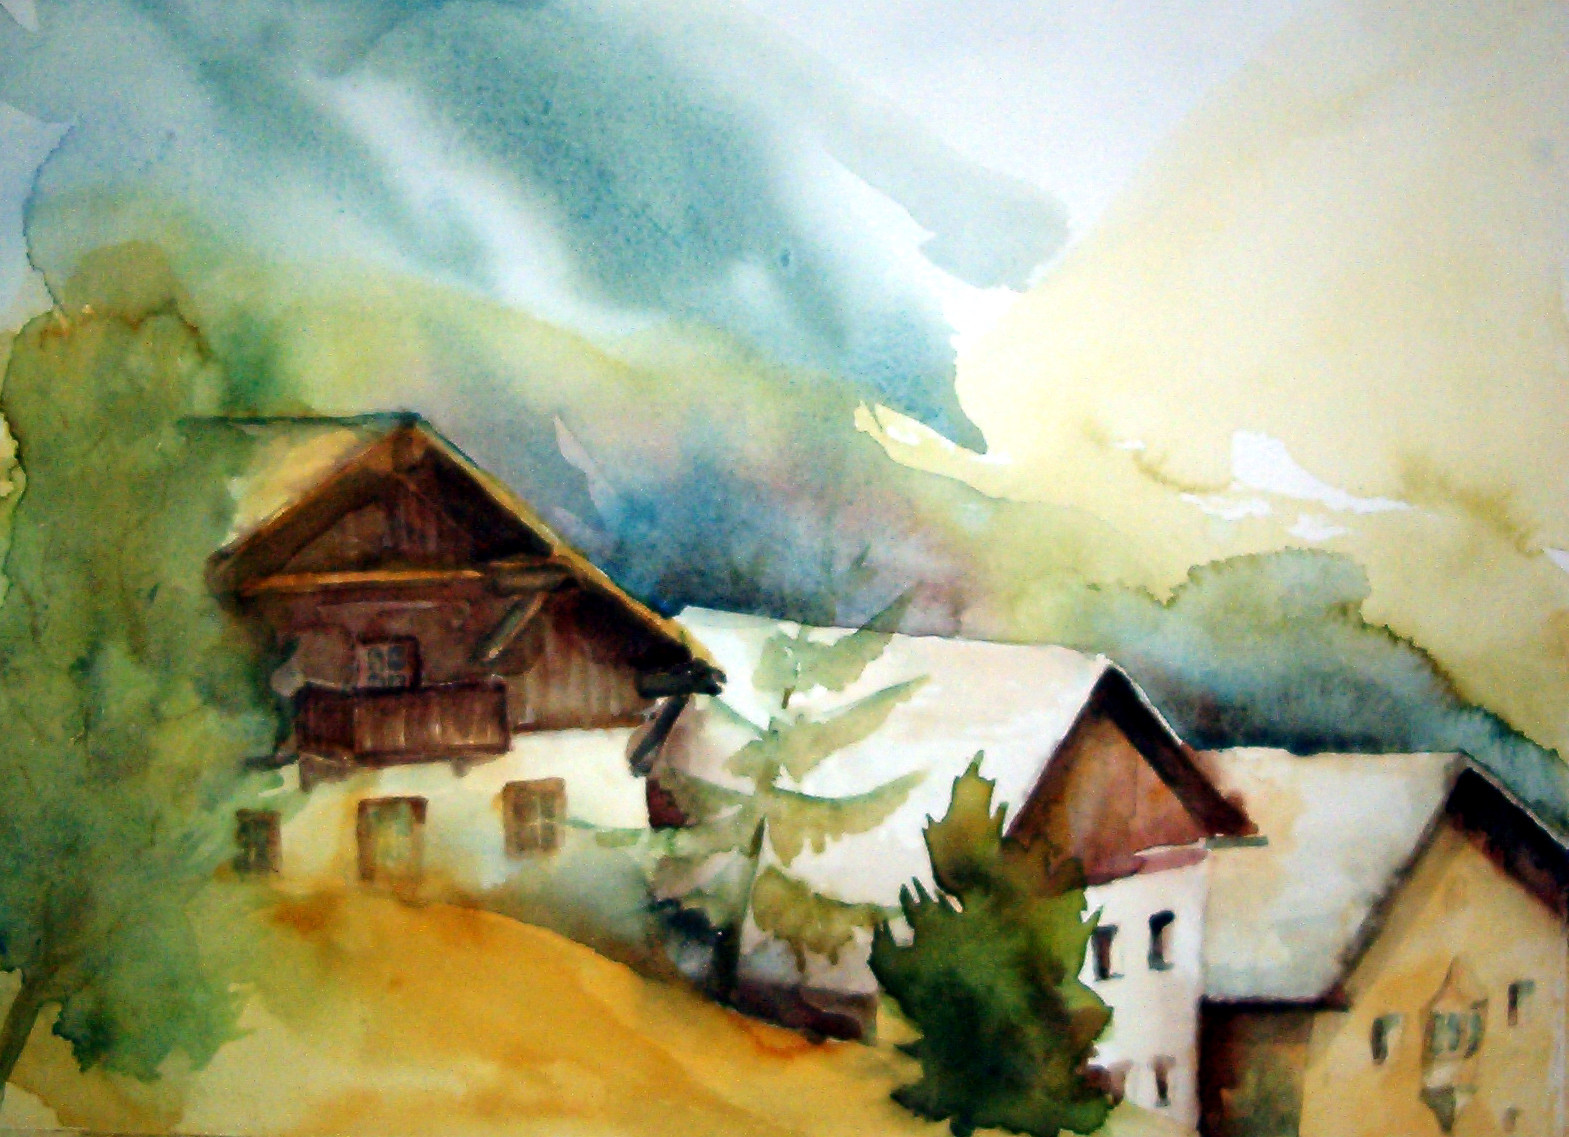 aquarell - höfe in patsch bei innsbruck